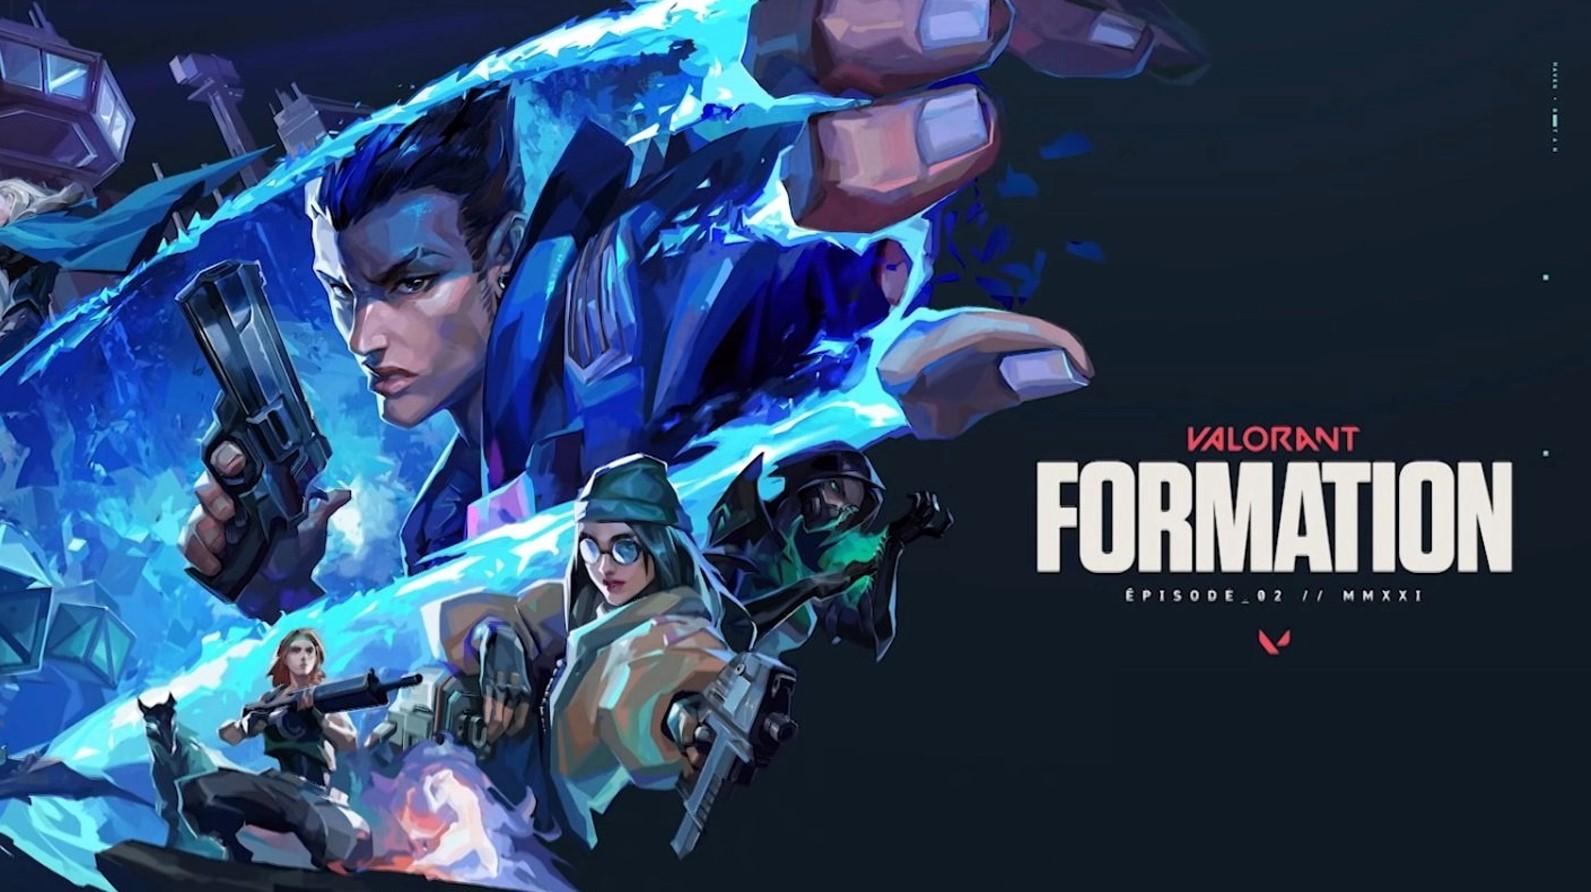 VALORANT Prime Gaming